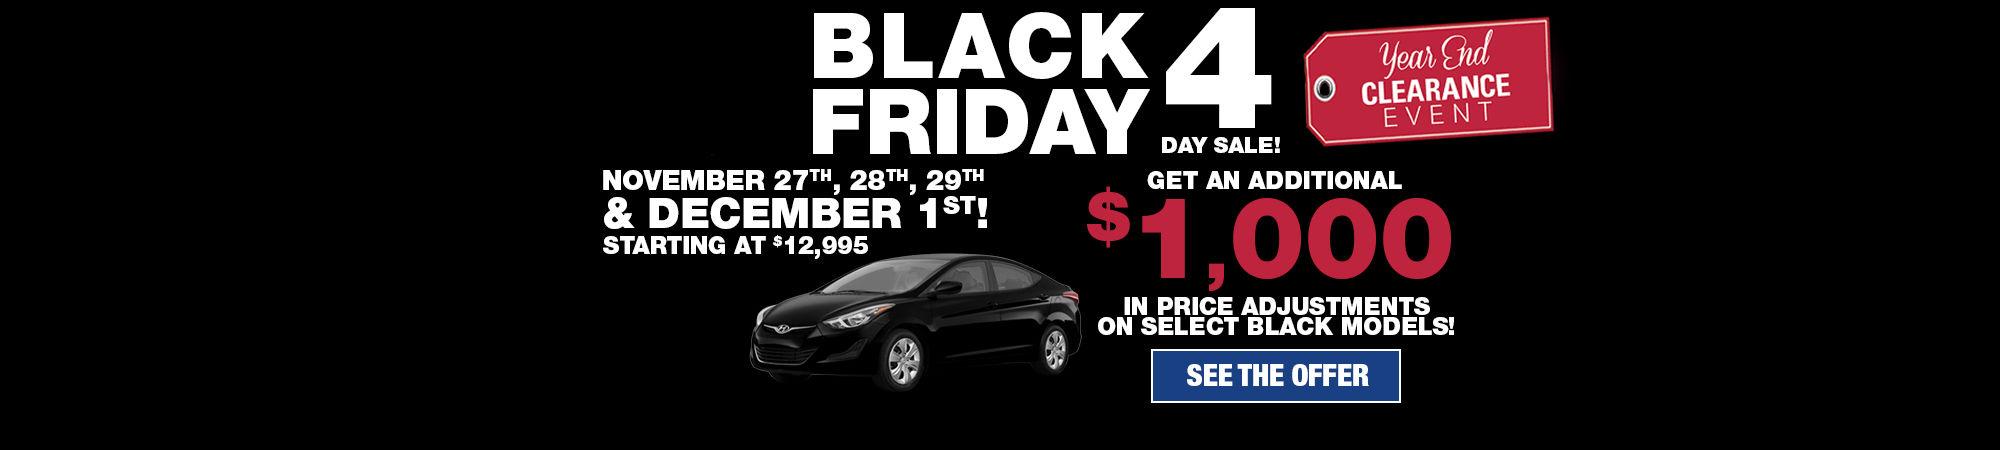 Black Friday 4 day sale!